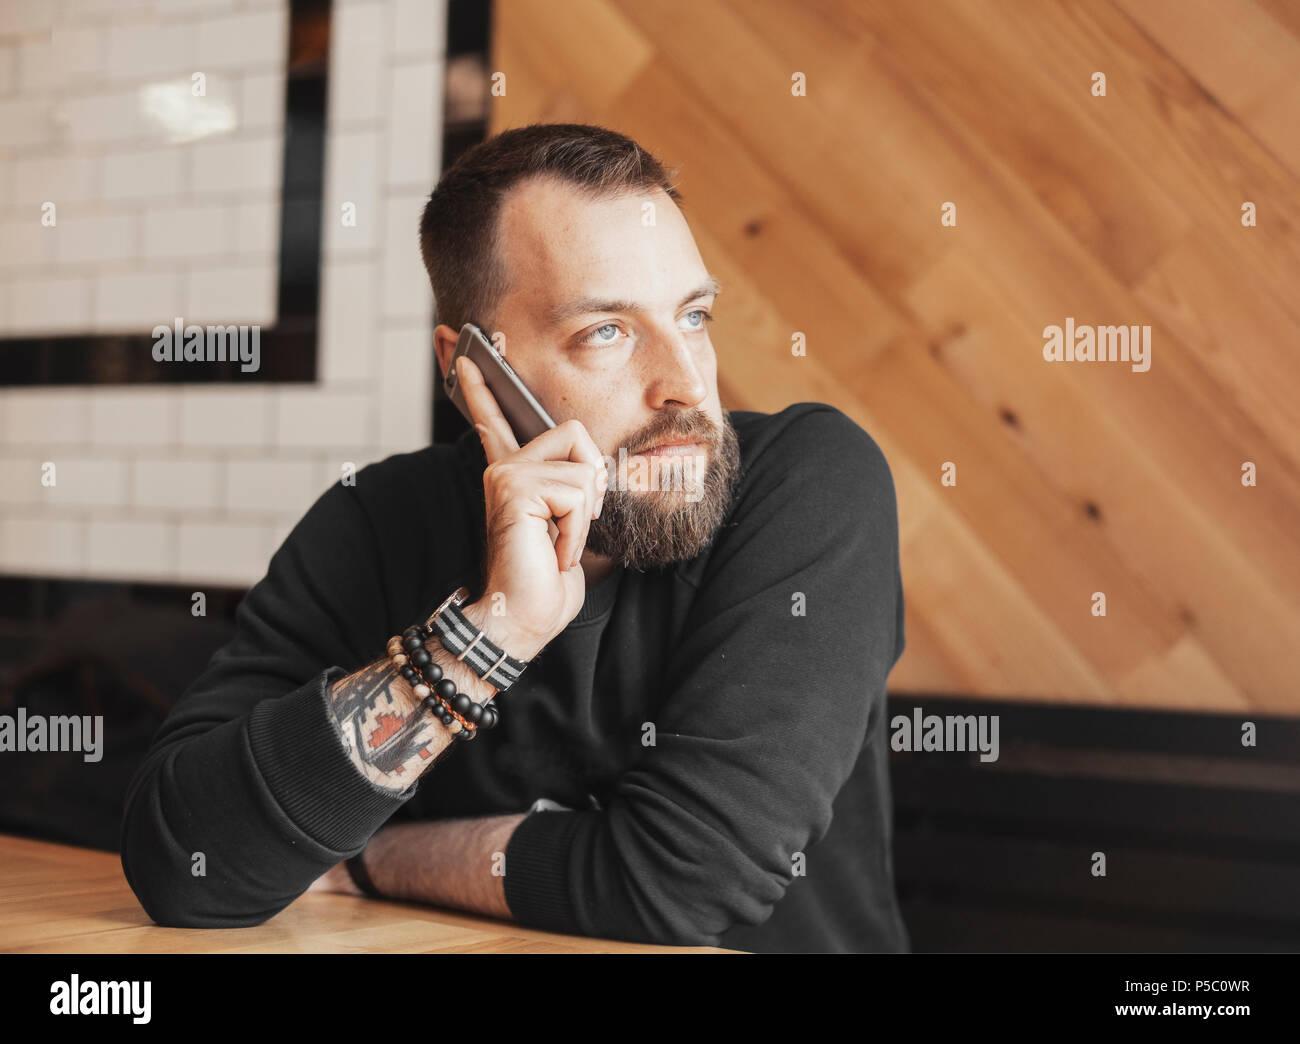 Attraktive tätowierten Mann per Telefon im Cafe Bärtigen. Stockbild